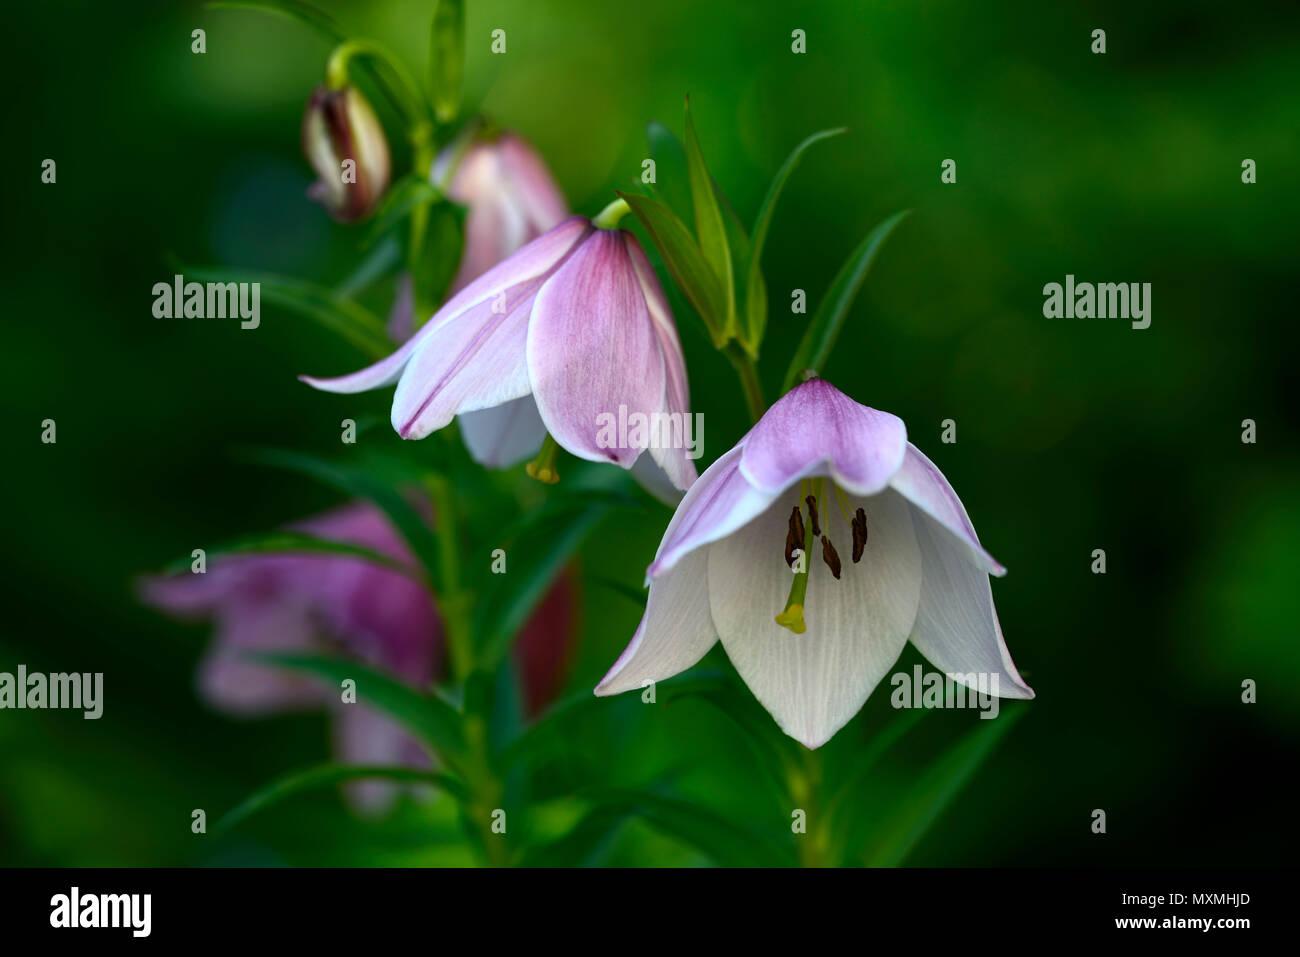 lilium mackliniae,Shirui,Siroi,lily,white,pink,species,lilies,naga ...